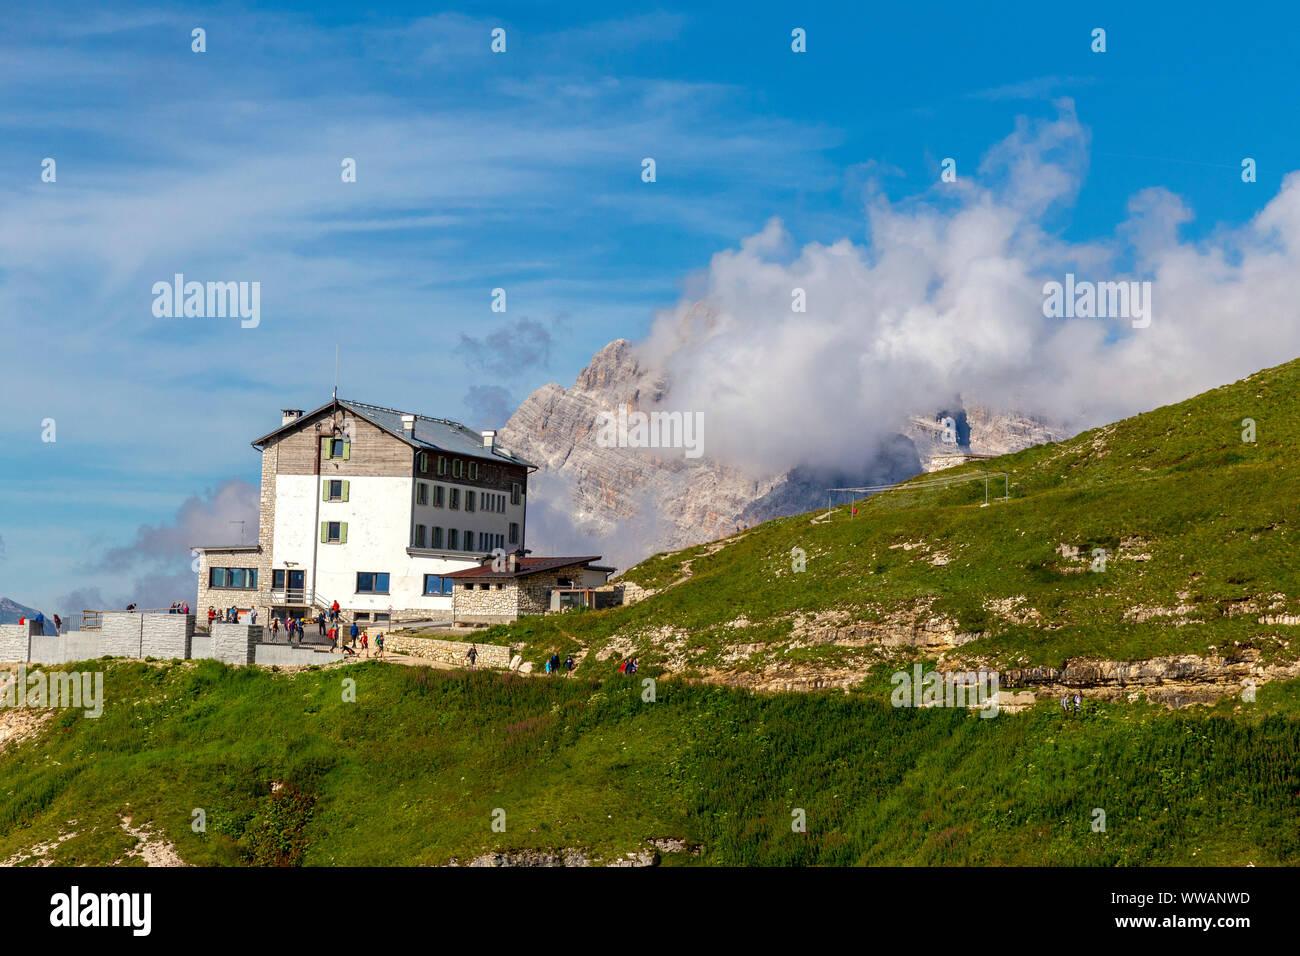 Auronzo alpine hut near the Three Peaks of Lavaredo, in the back Monte Campedelle and Col de le Bisse, Sexten Dolomites Stock Photo